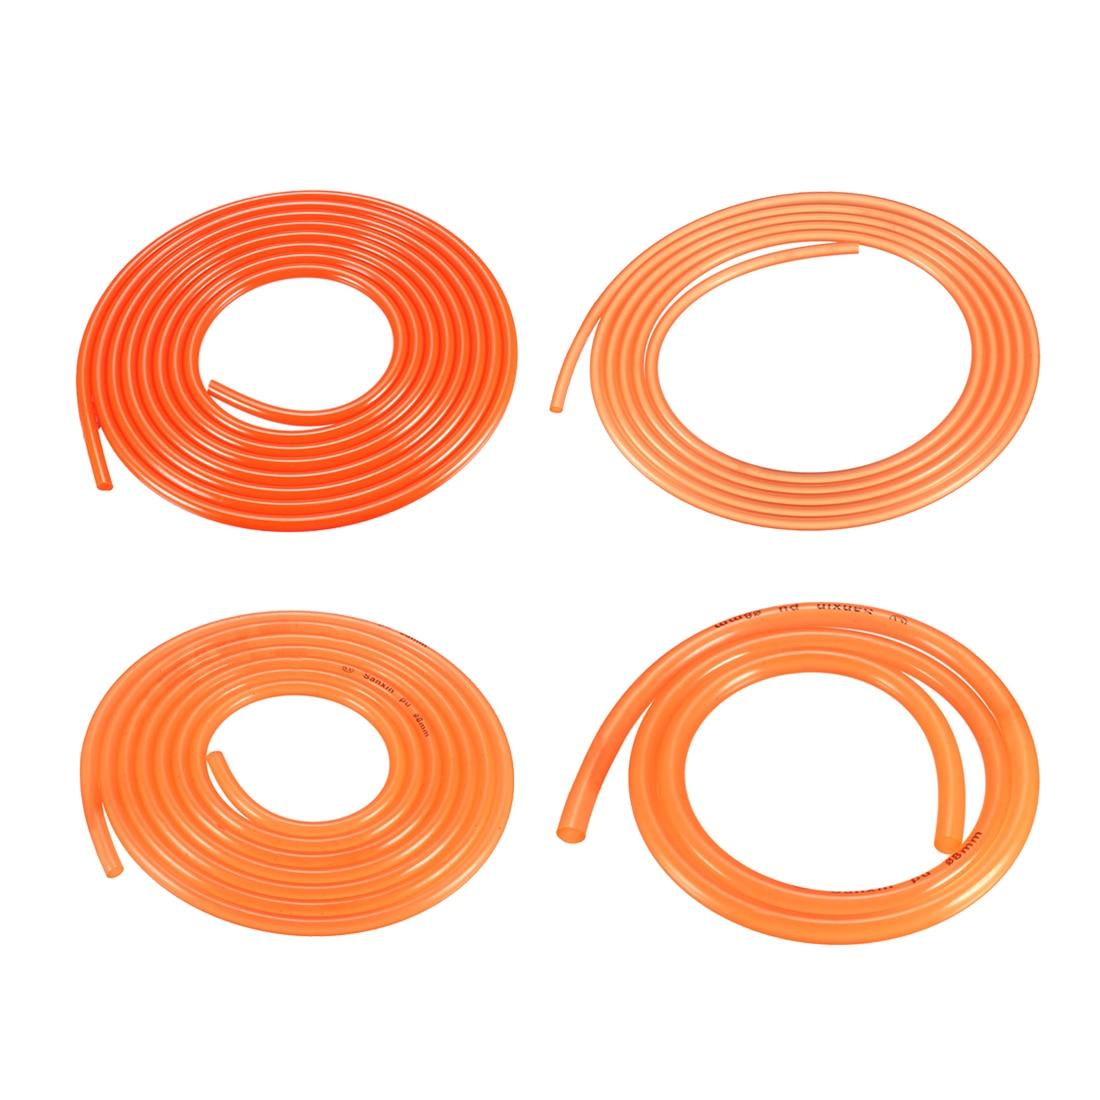 uxcell 3mm-12mm Dia PU Transmission Round Belt High Performance Smooth Urethane Belting for Conveyor Bonding Machine Dryer